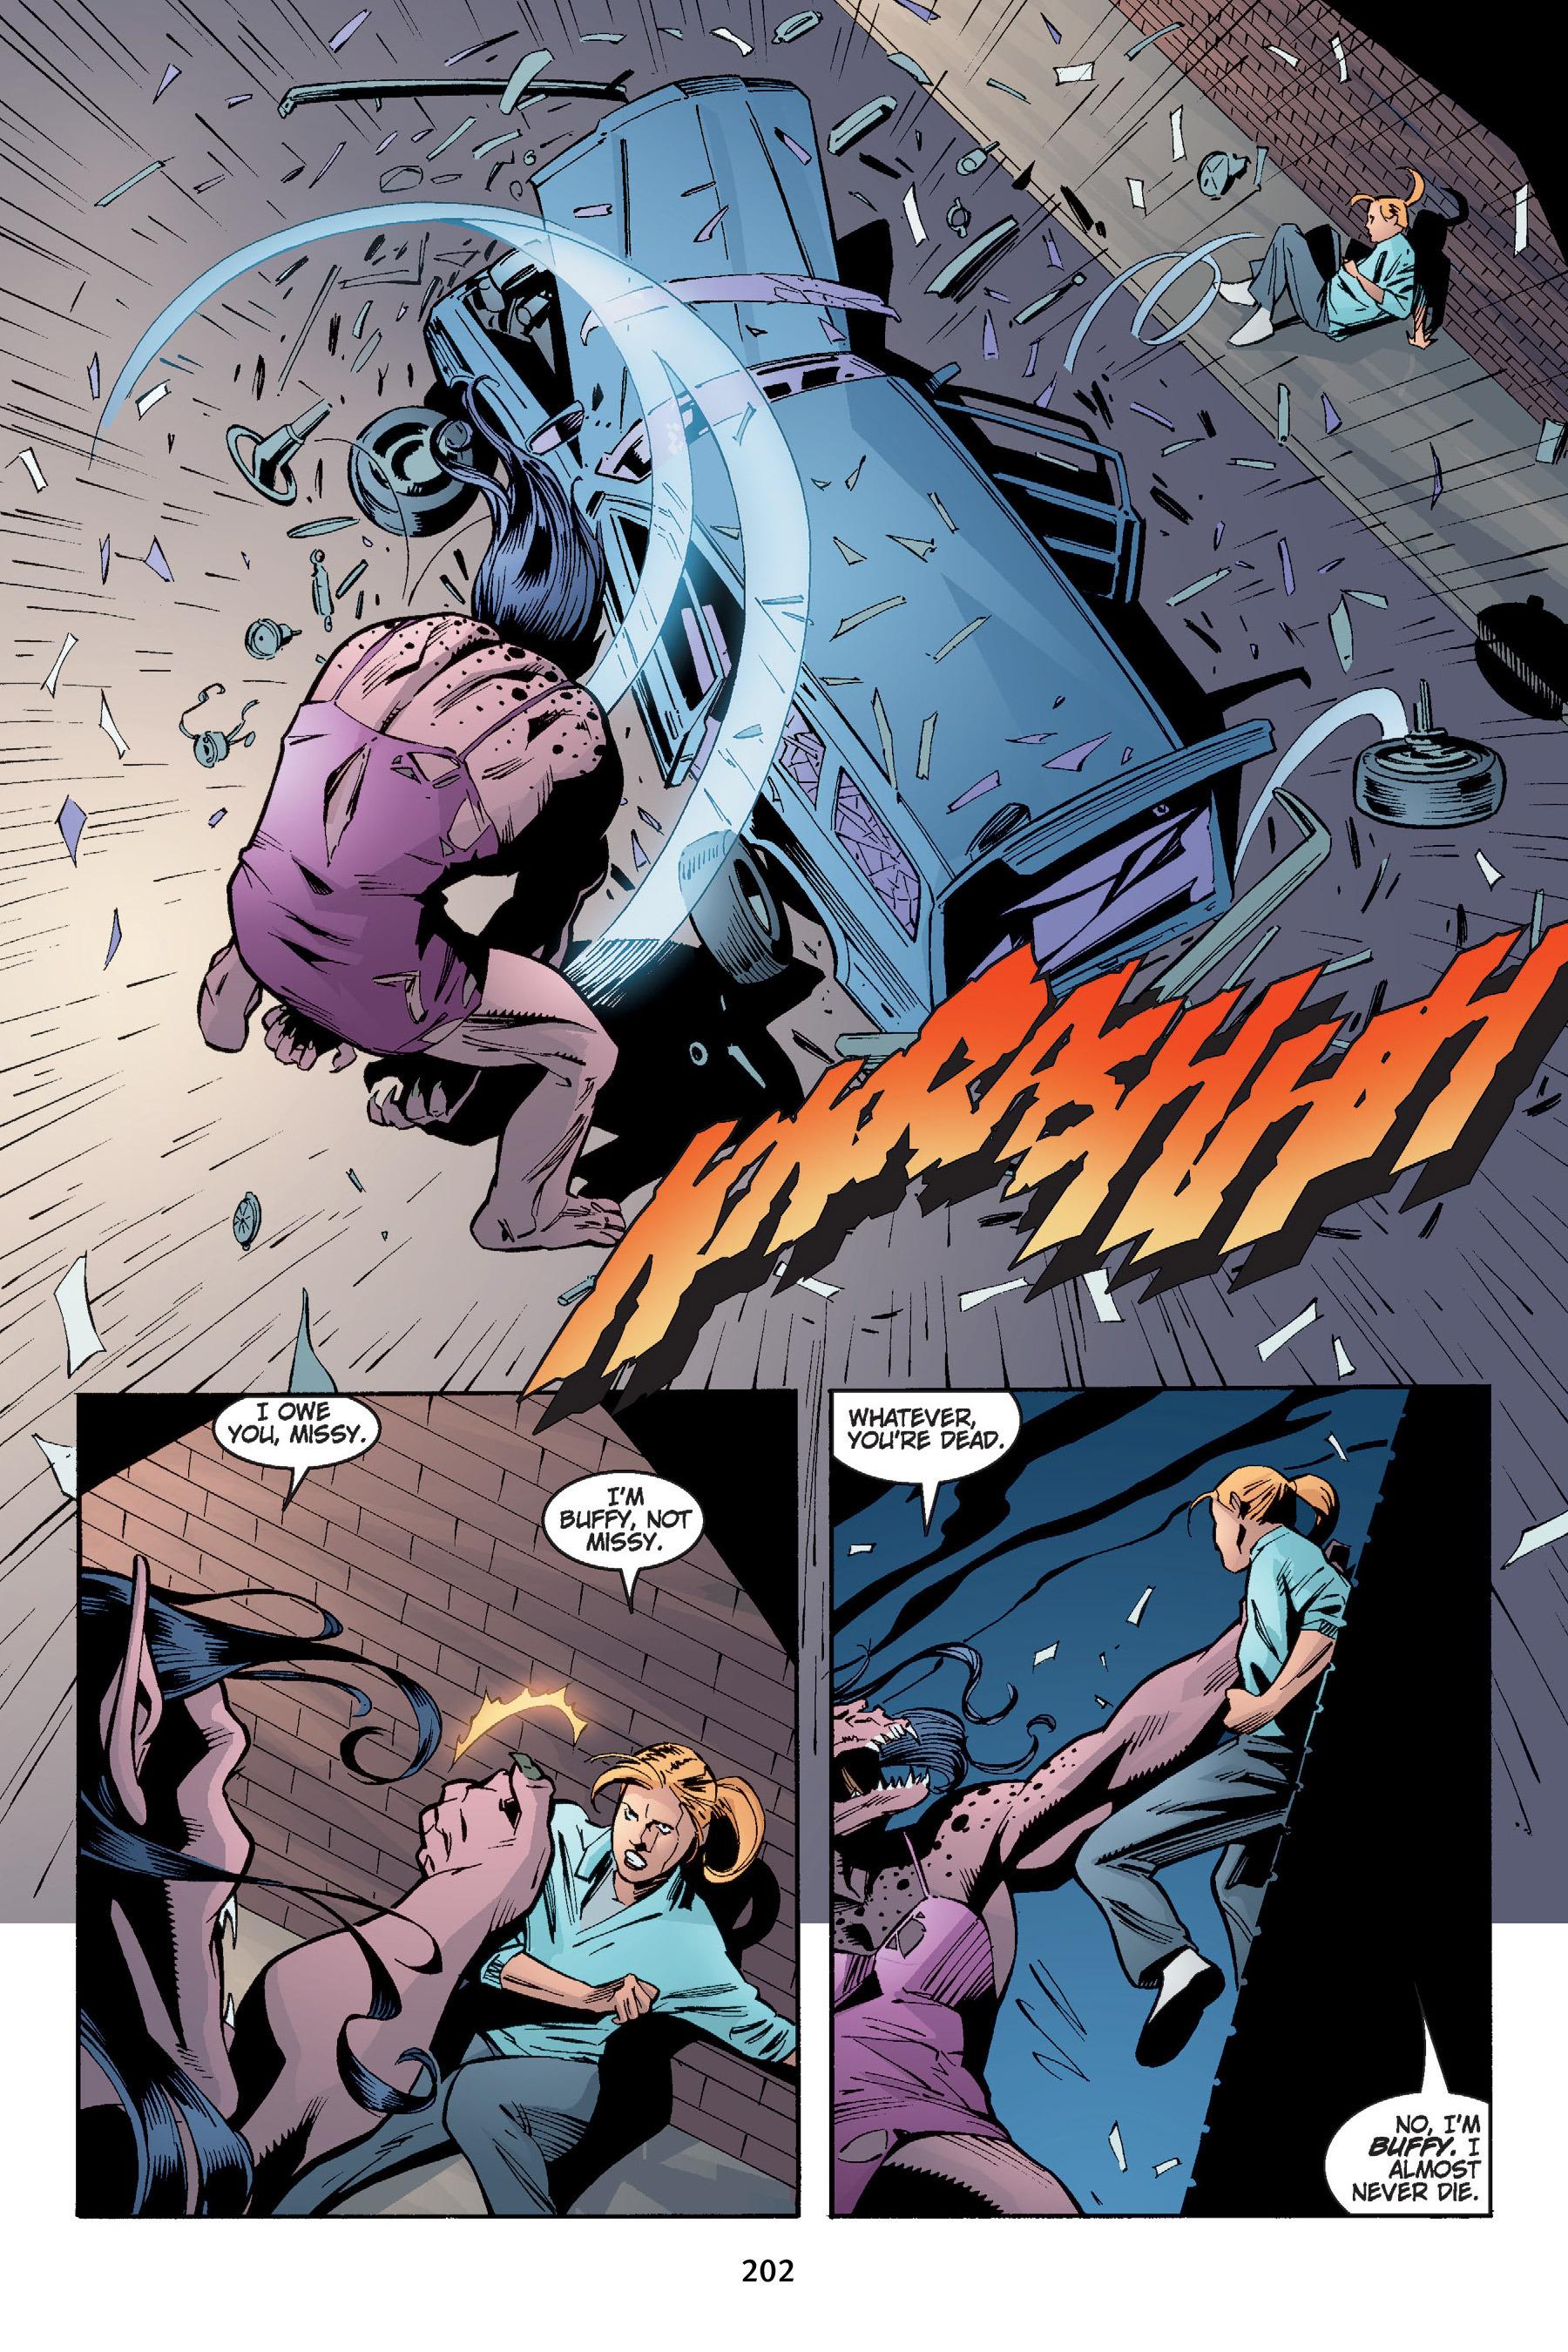 Read online Buffy the Vampire Slayer: Omnibus comic -  Issue # TPB 4 - 202